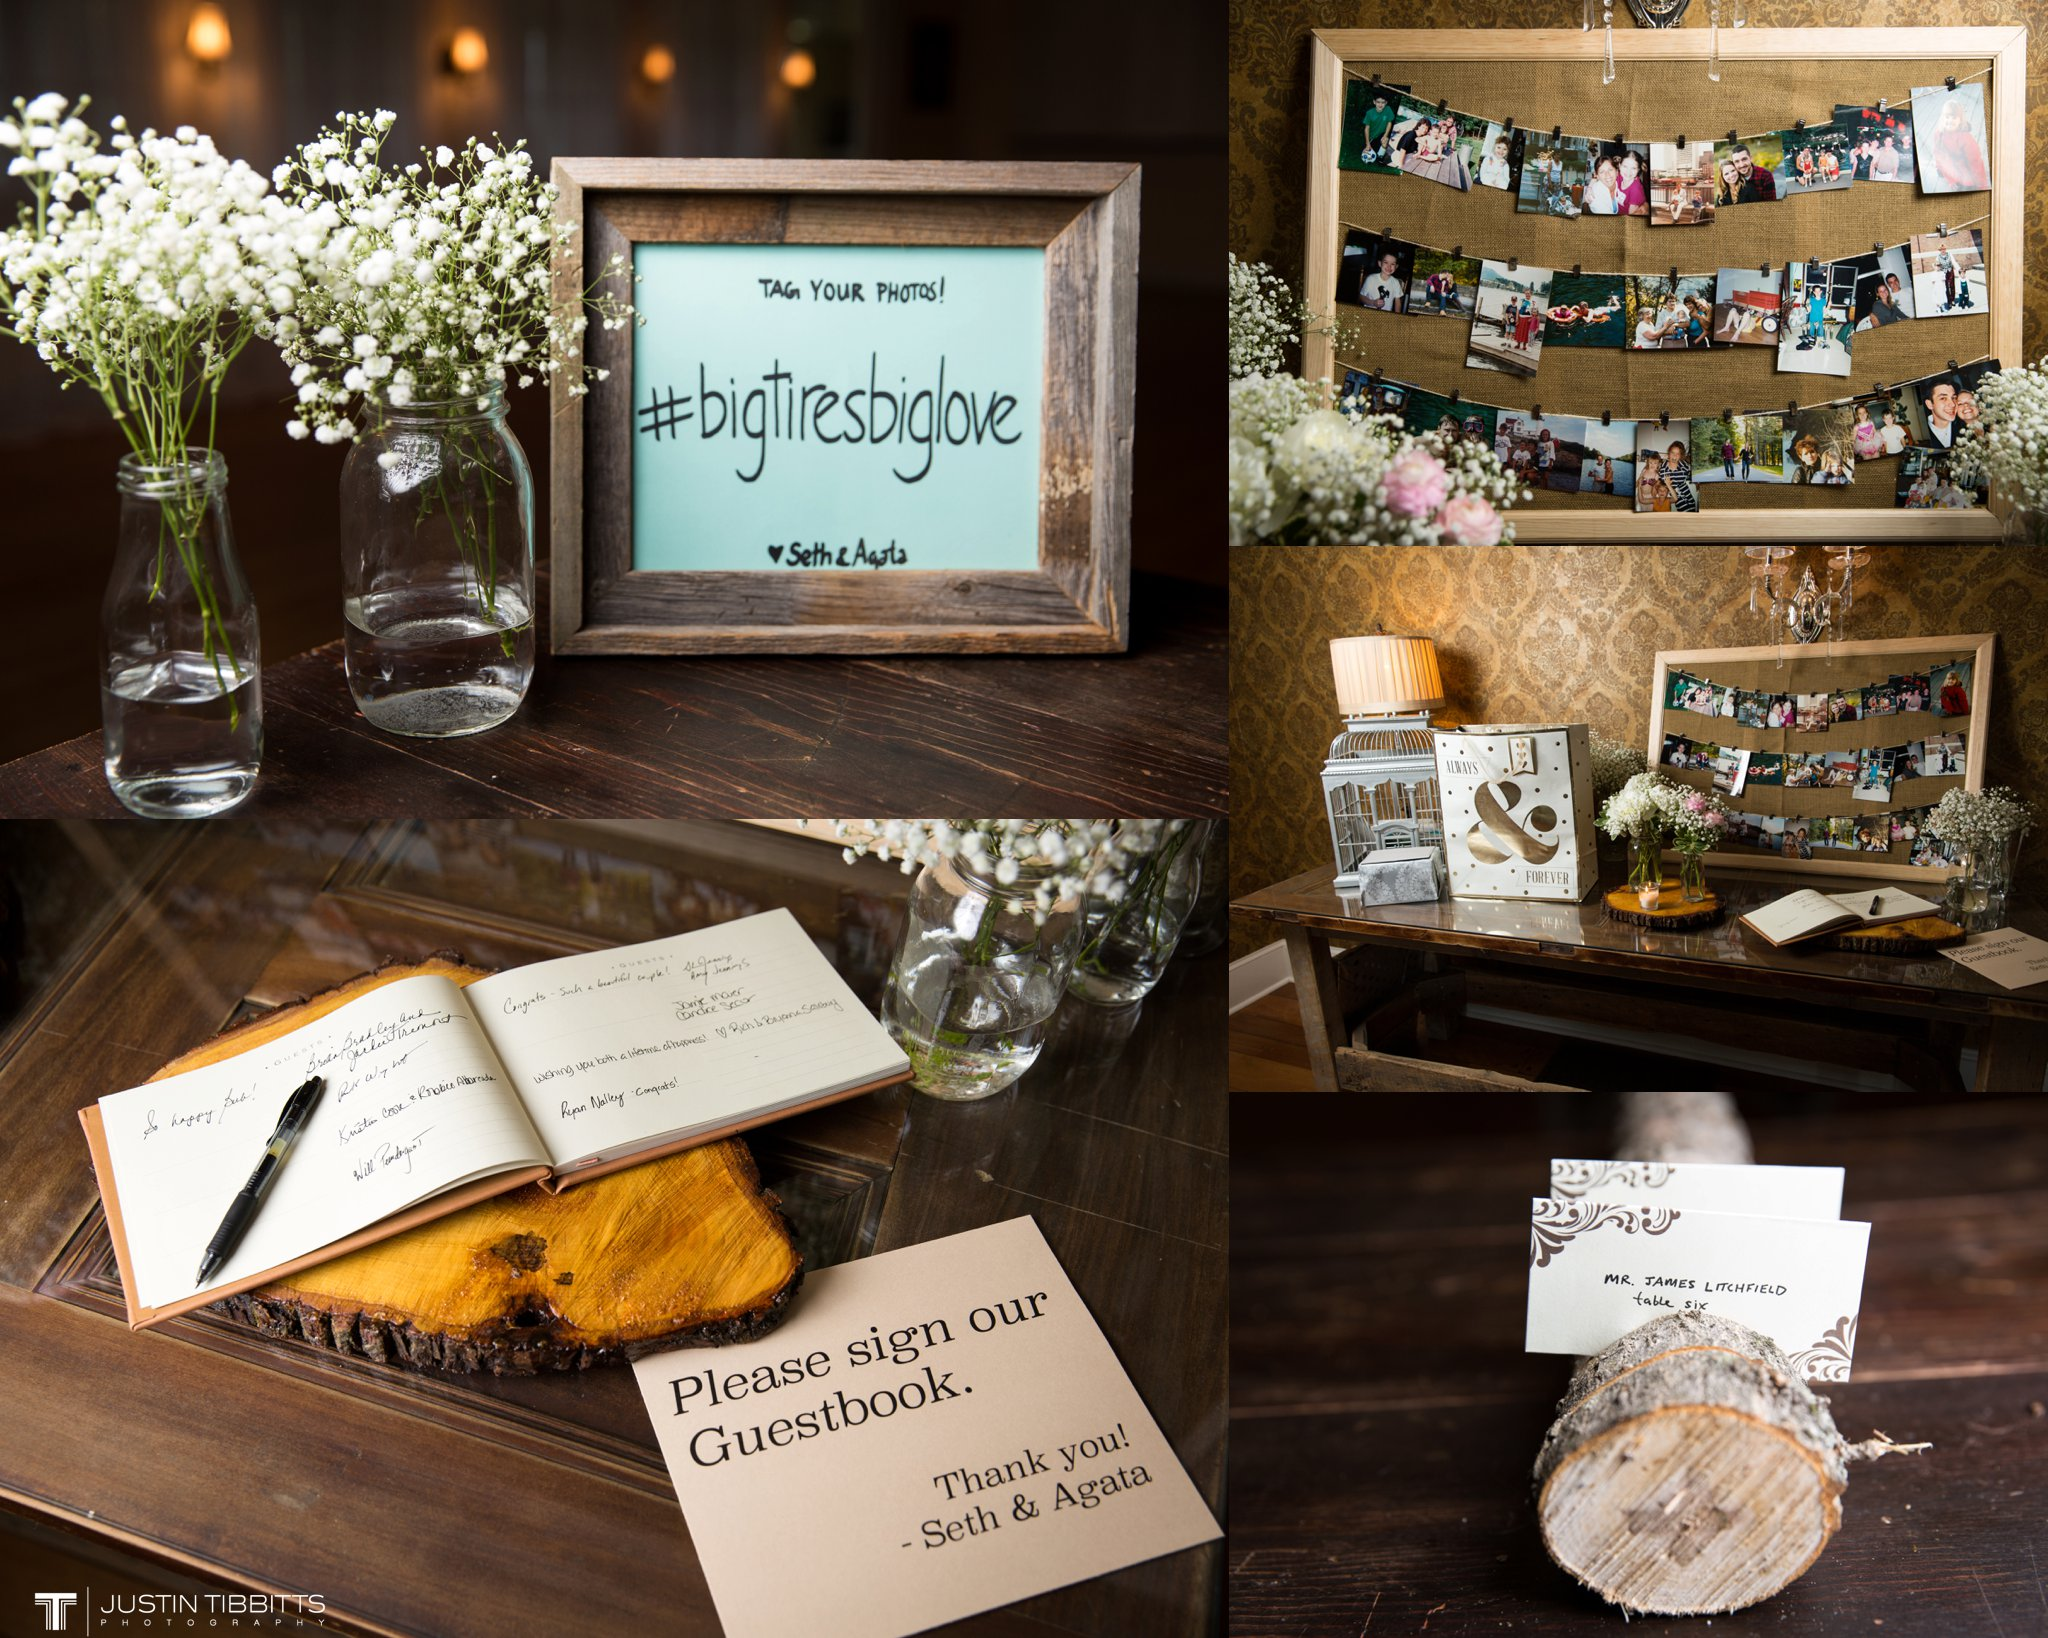 crooked-lake-house-wedding-photos-with-agata-and-seth_0114